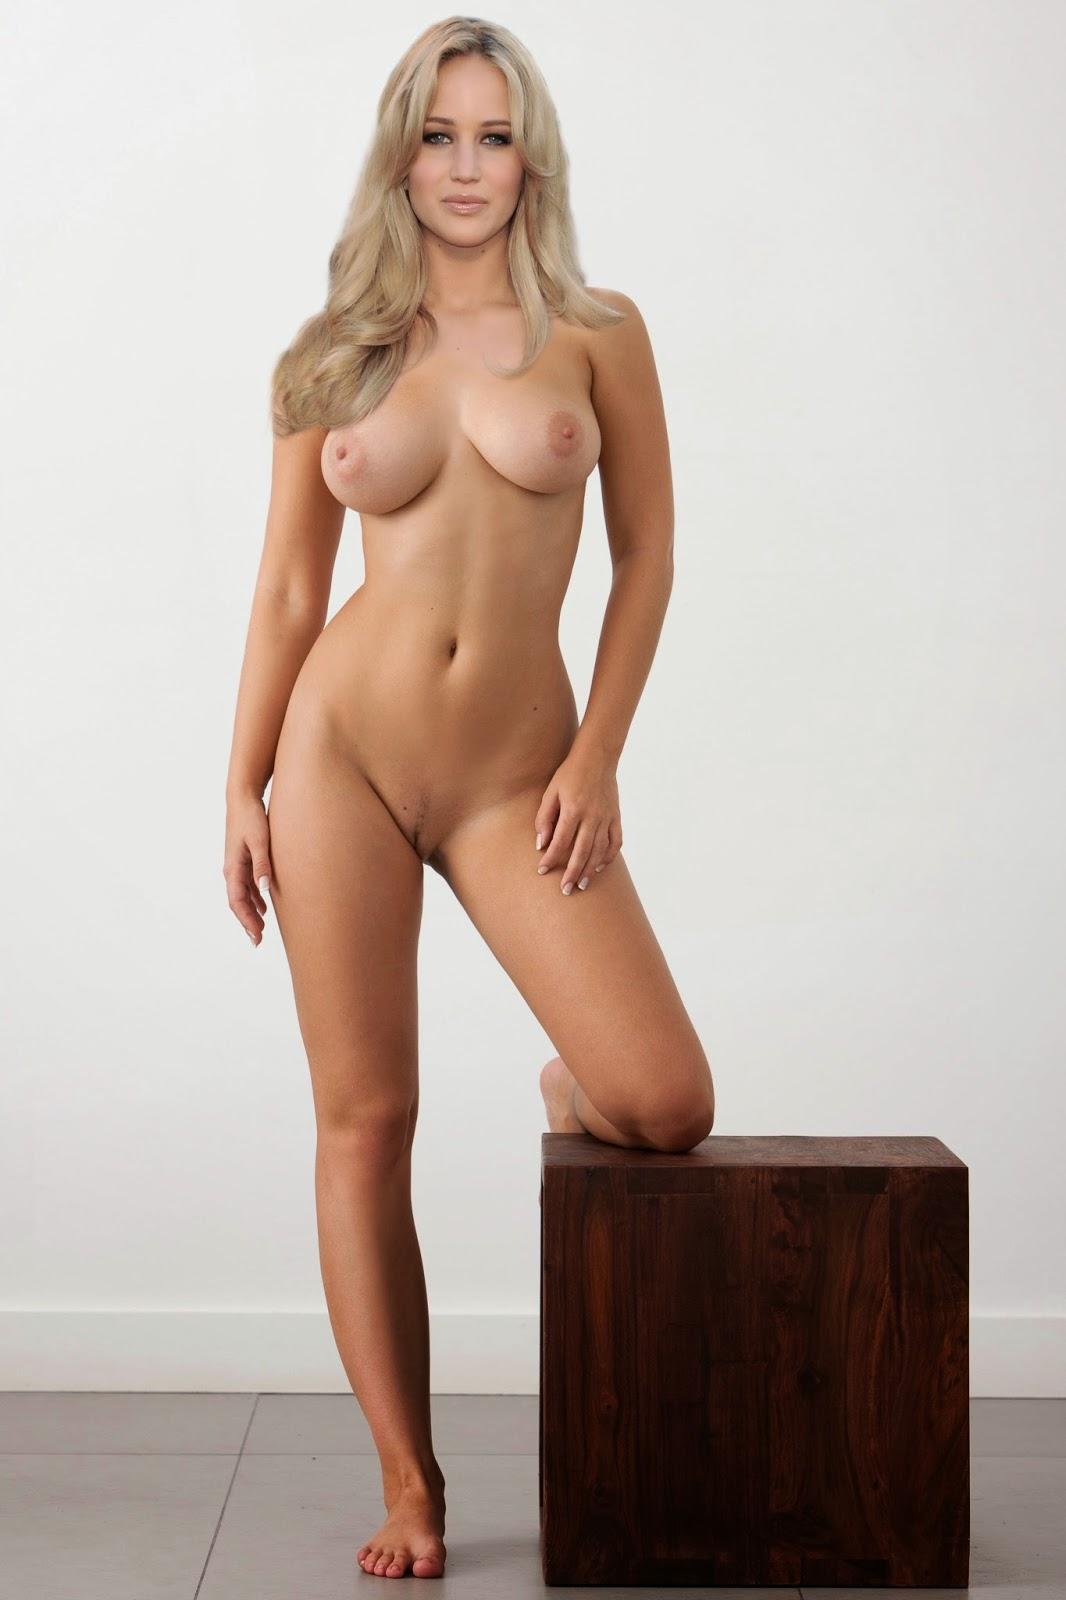 Naked women lawrence kansas picture 870